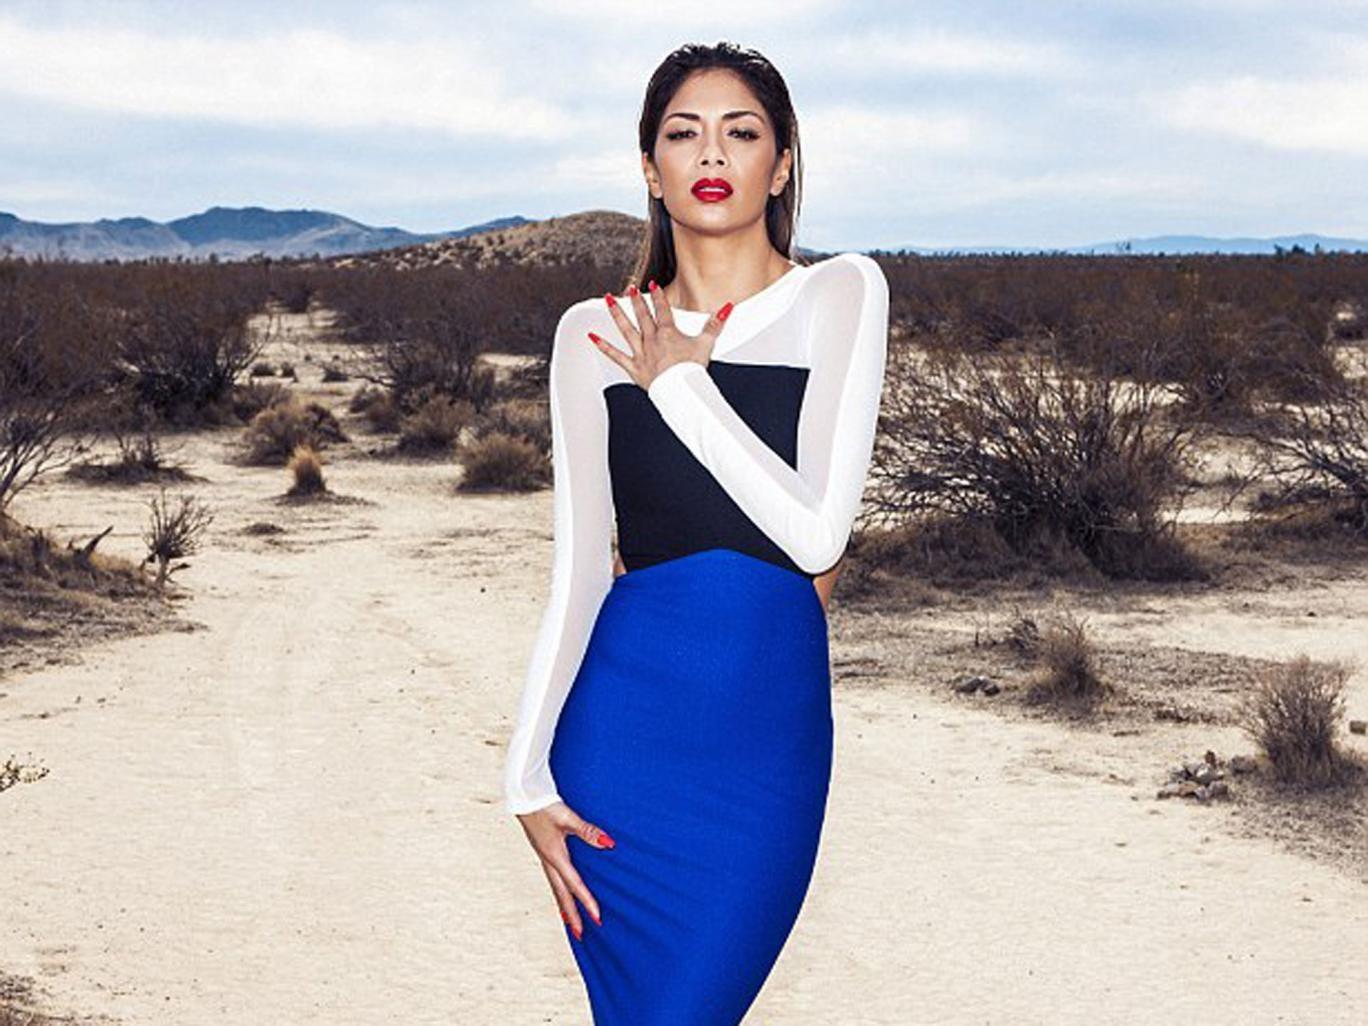 Missguided sells a range designed by former Pussycat Dolls singer and X Factor judge Nicole Scherzinge